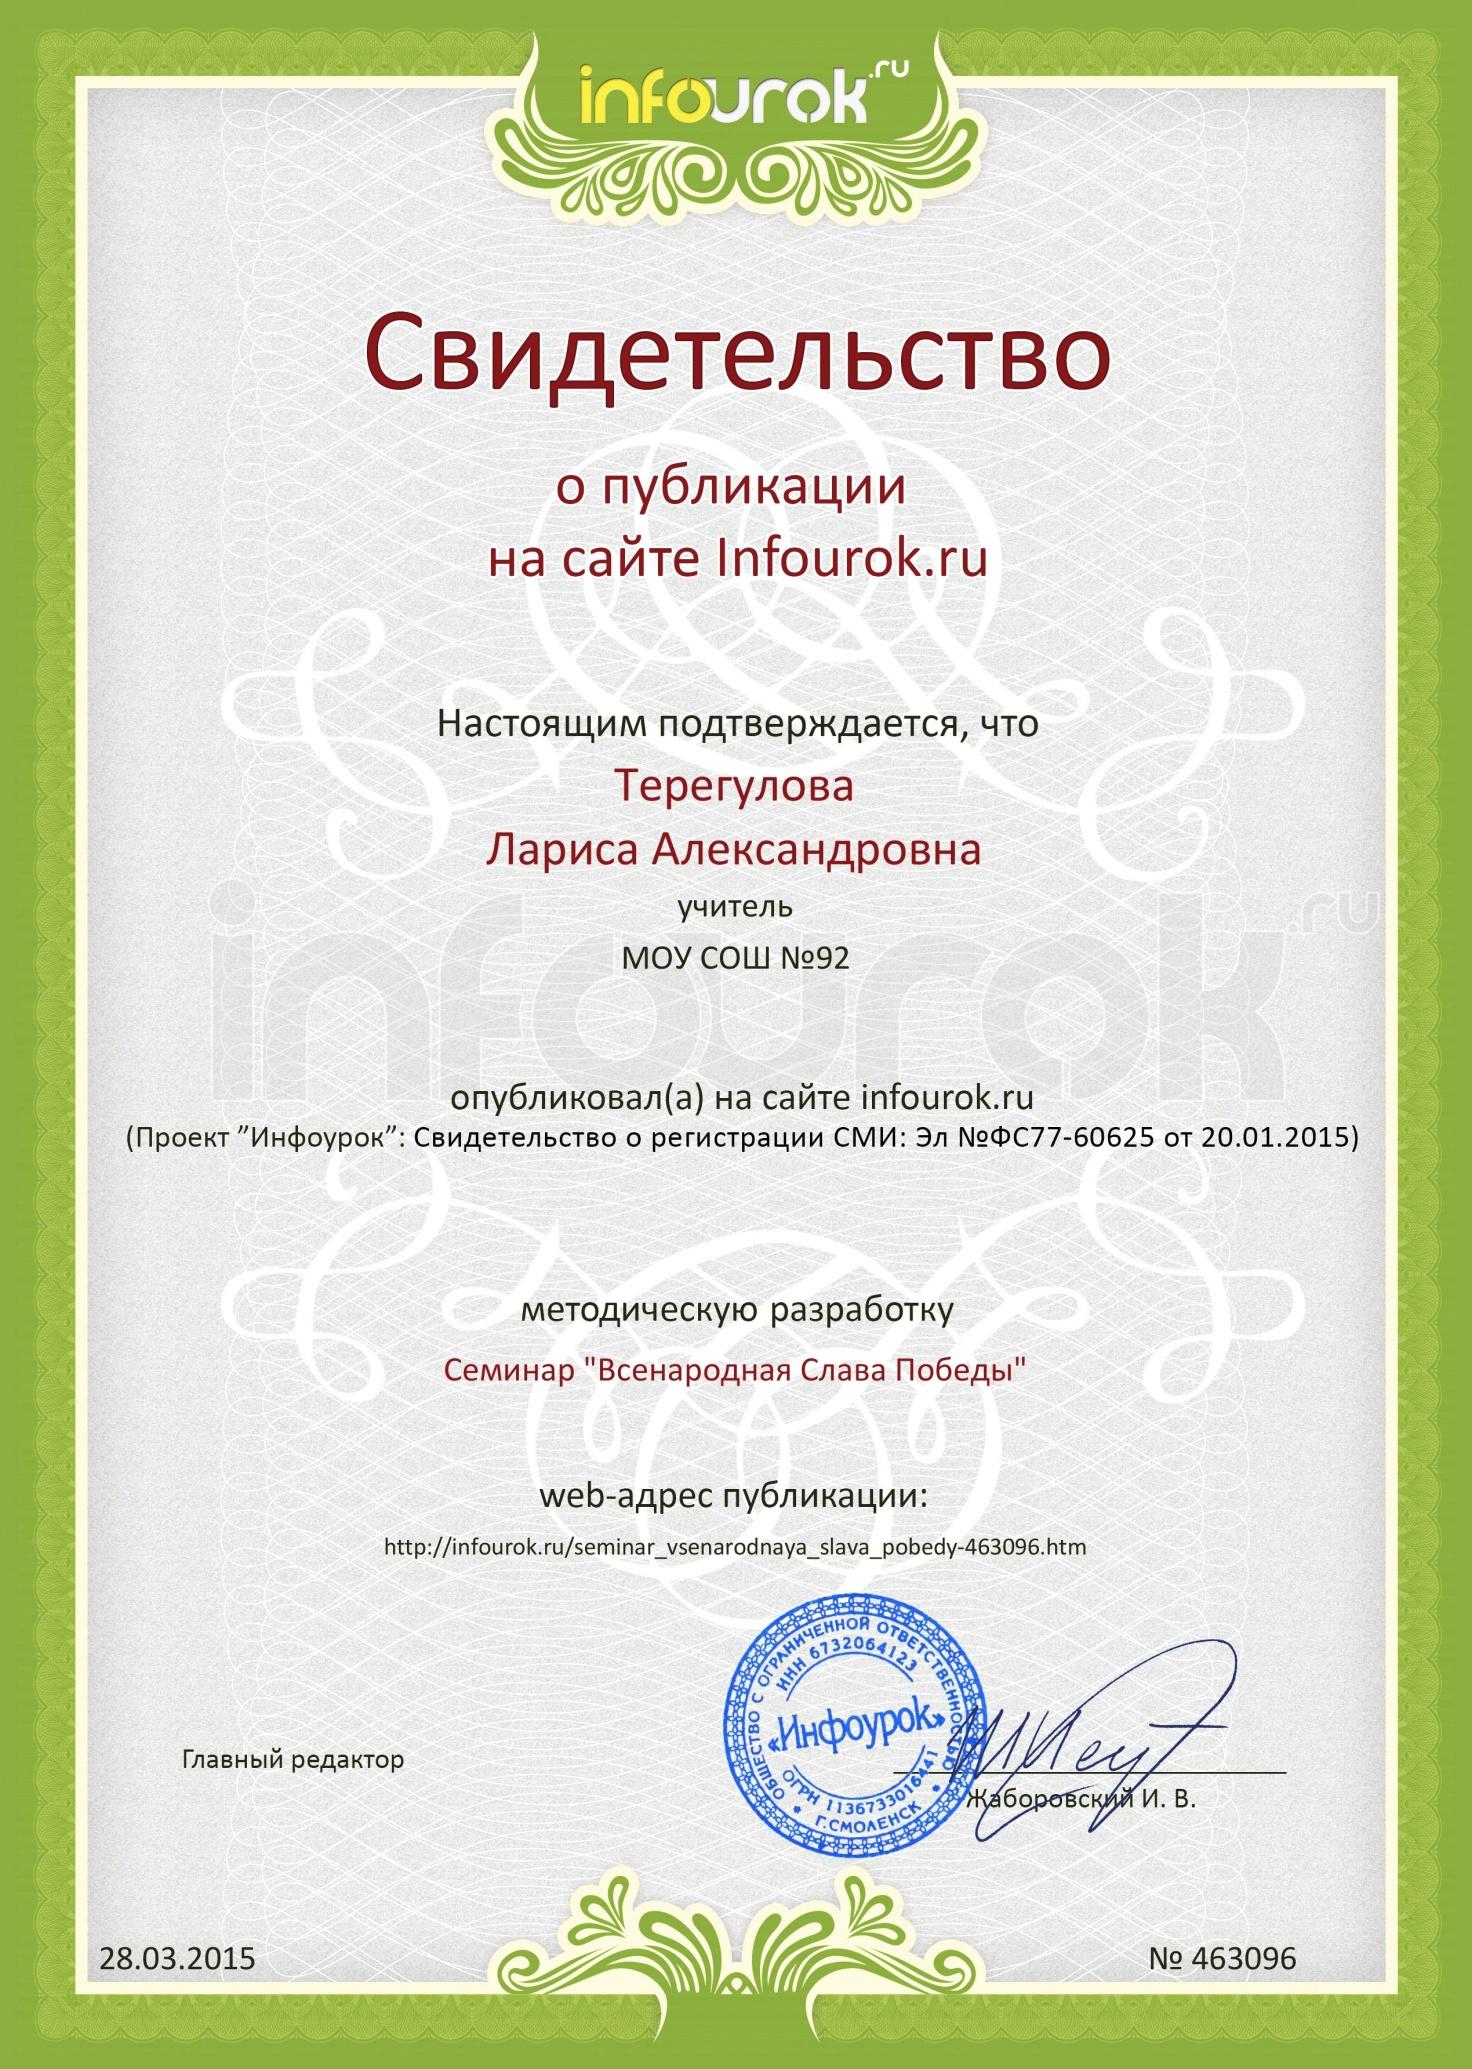 Сертификат проекта infourok.ru № 463096.jpg